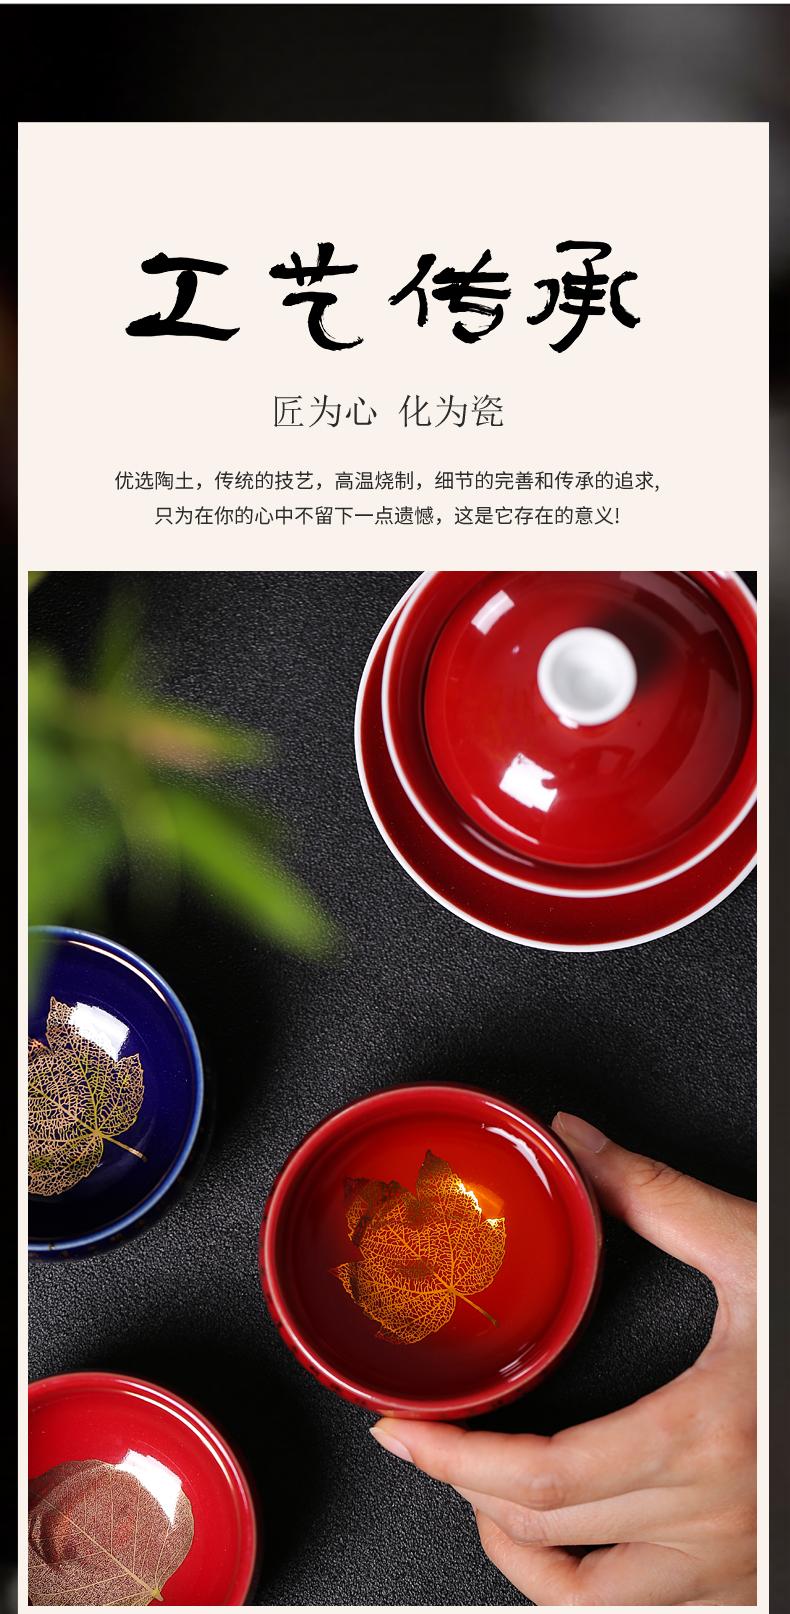 Suet jade kung fu tea cups heart sutra master cup white porcelain sample tea cup, ceramic keller cup bowl is purple sand tea sets list